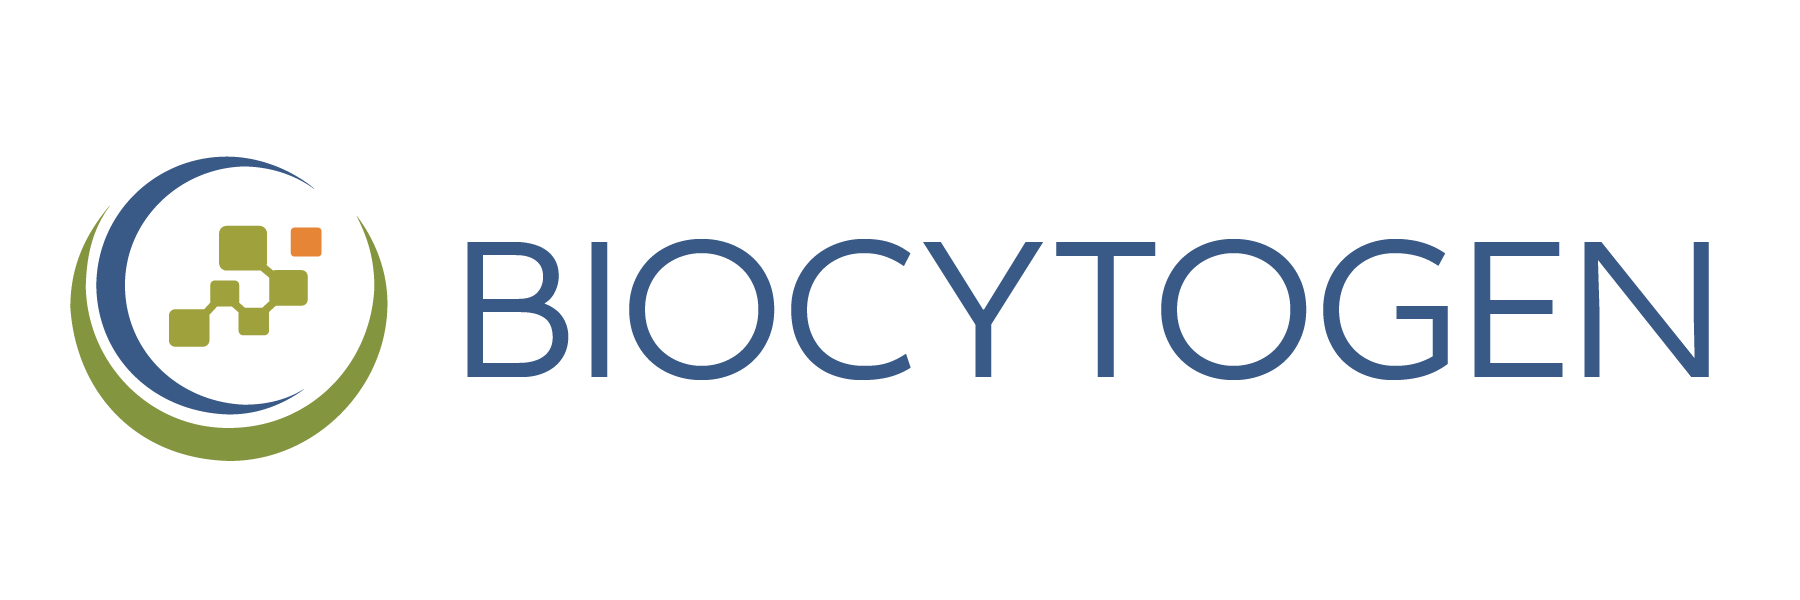 Biocytogen logo (herizontal)